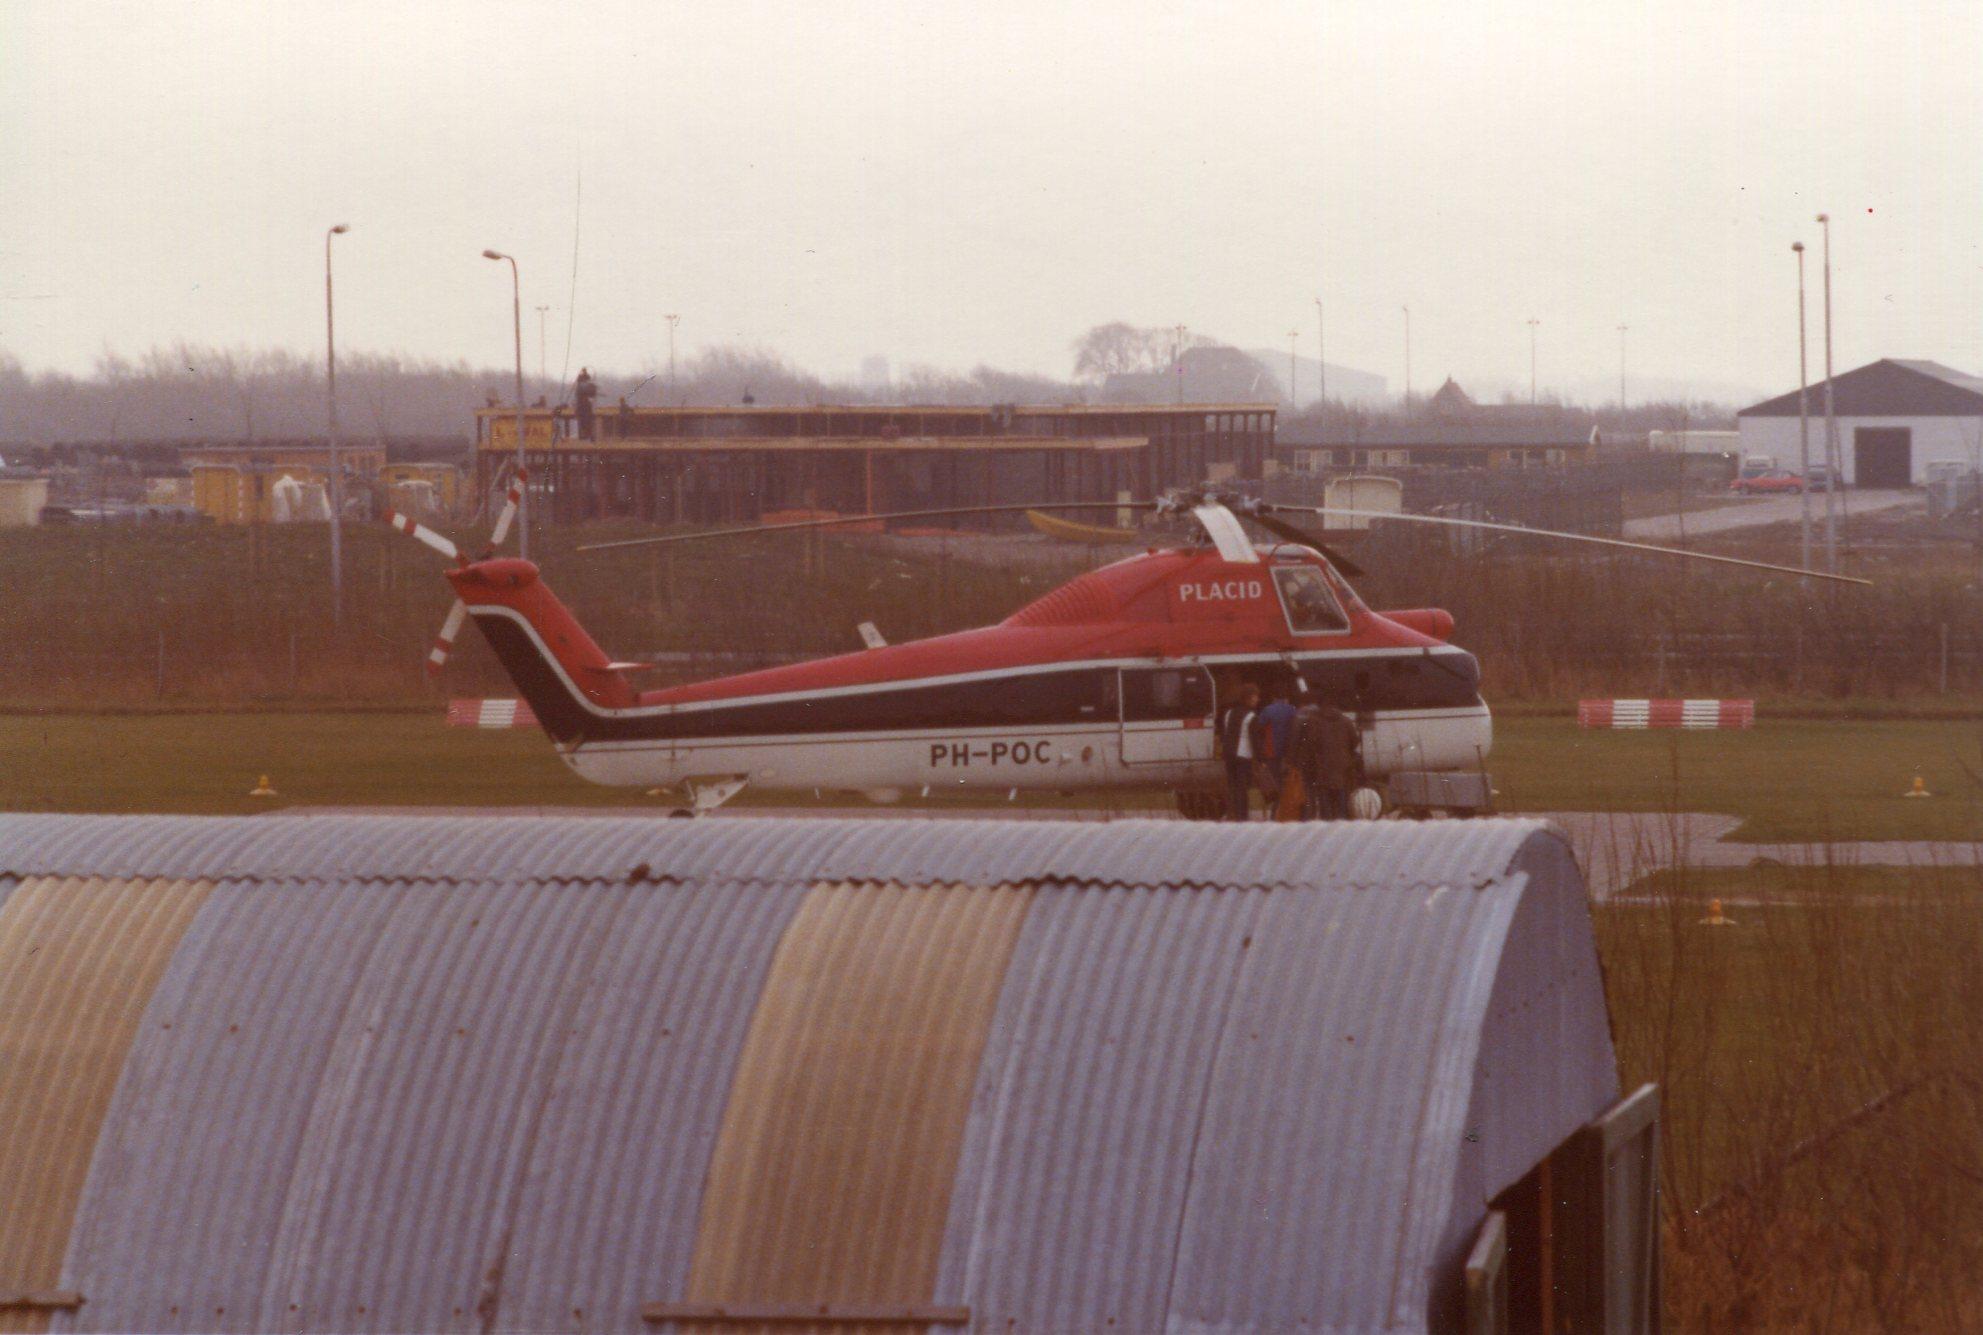 Naam: Den Helder , april 1977 (2).jpg Bekeken: 399 Grootte: 271,9 KB